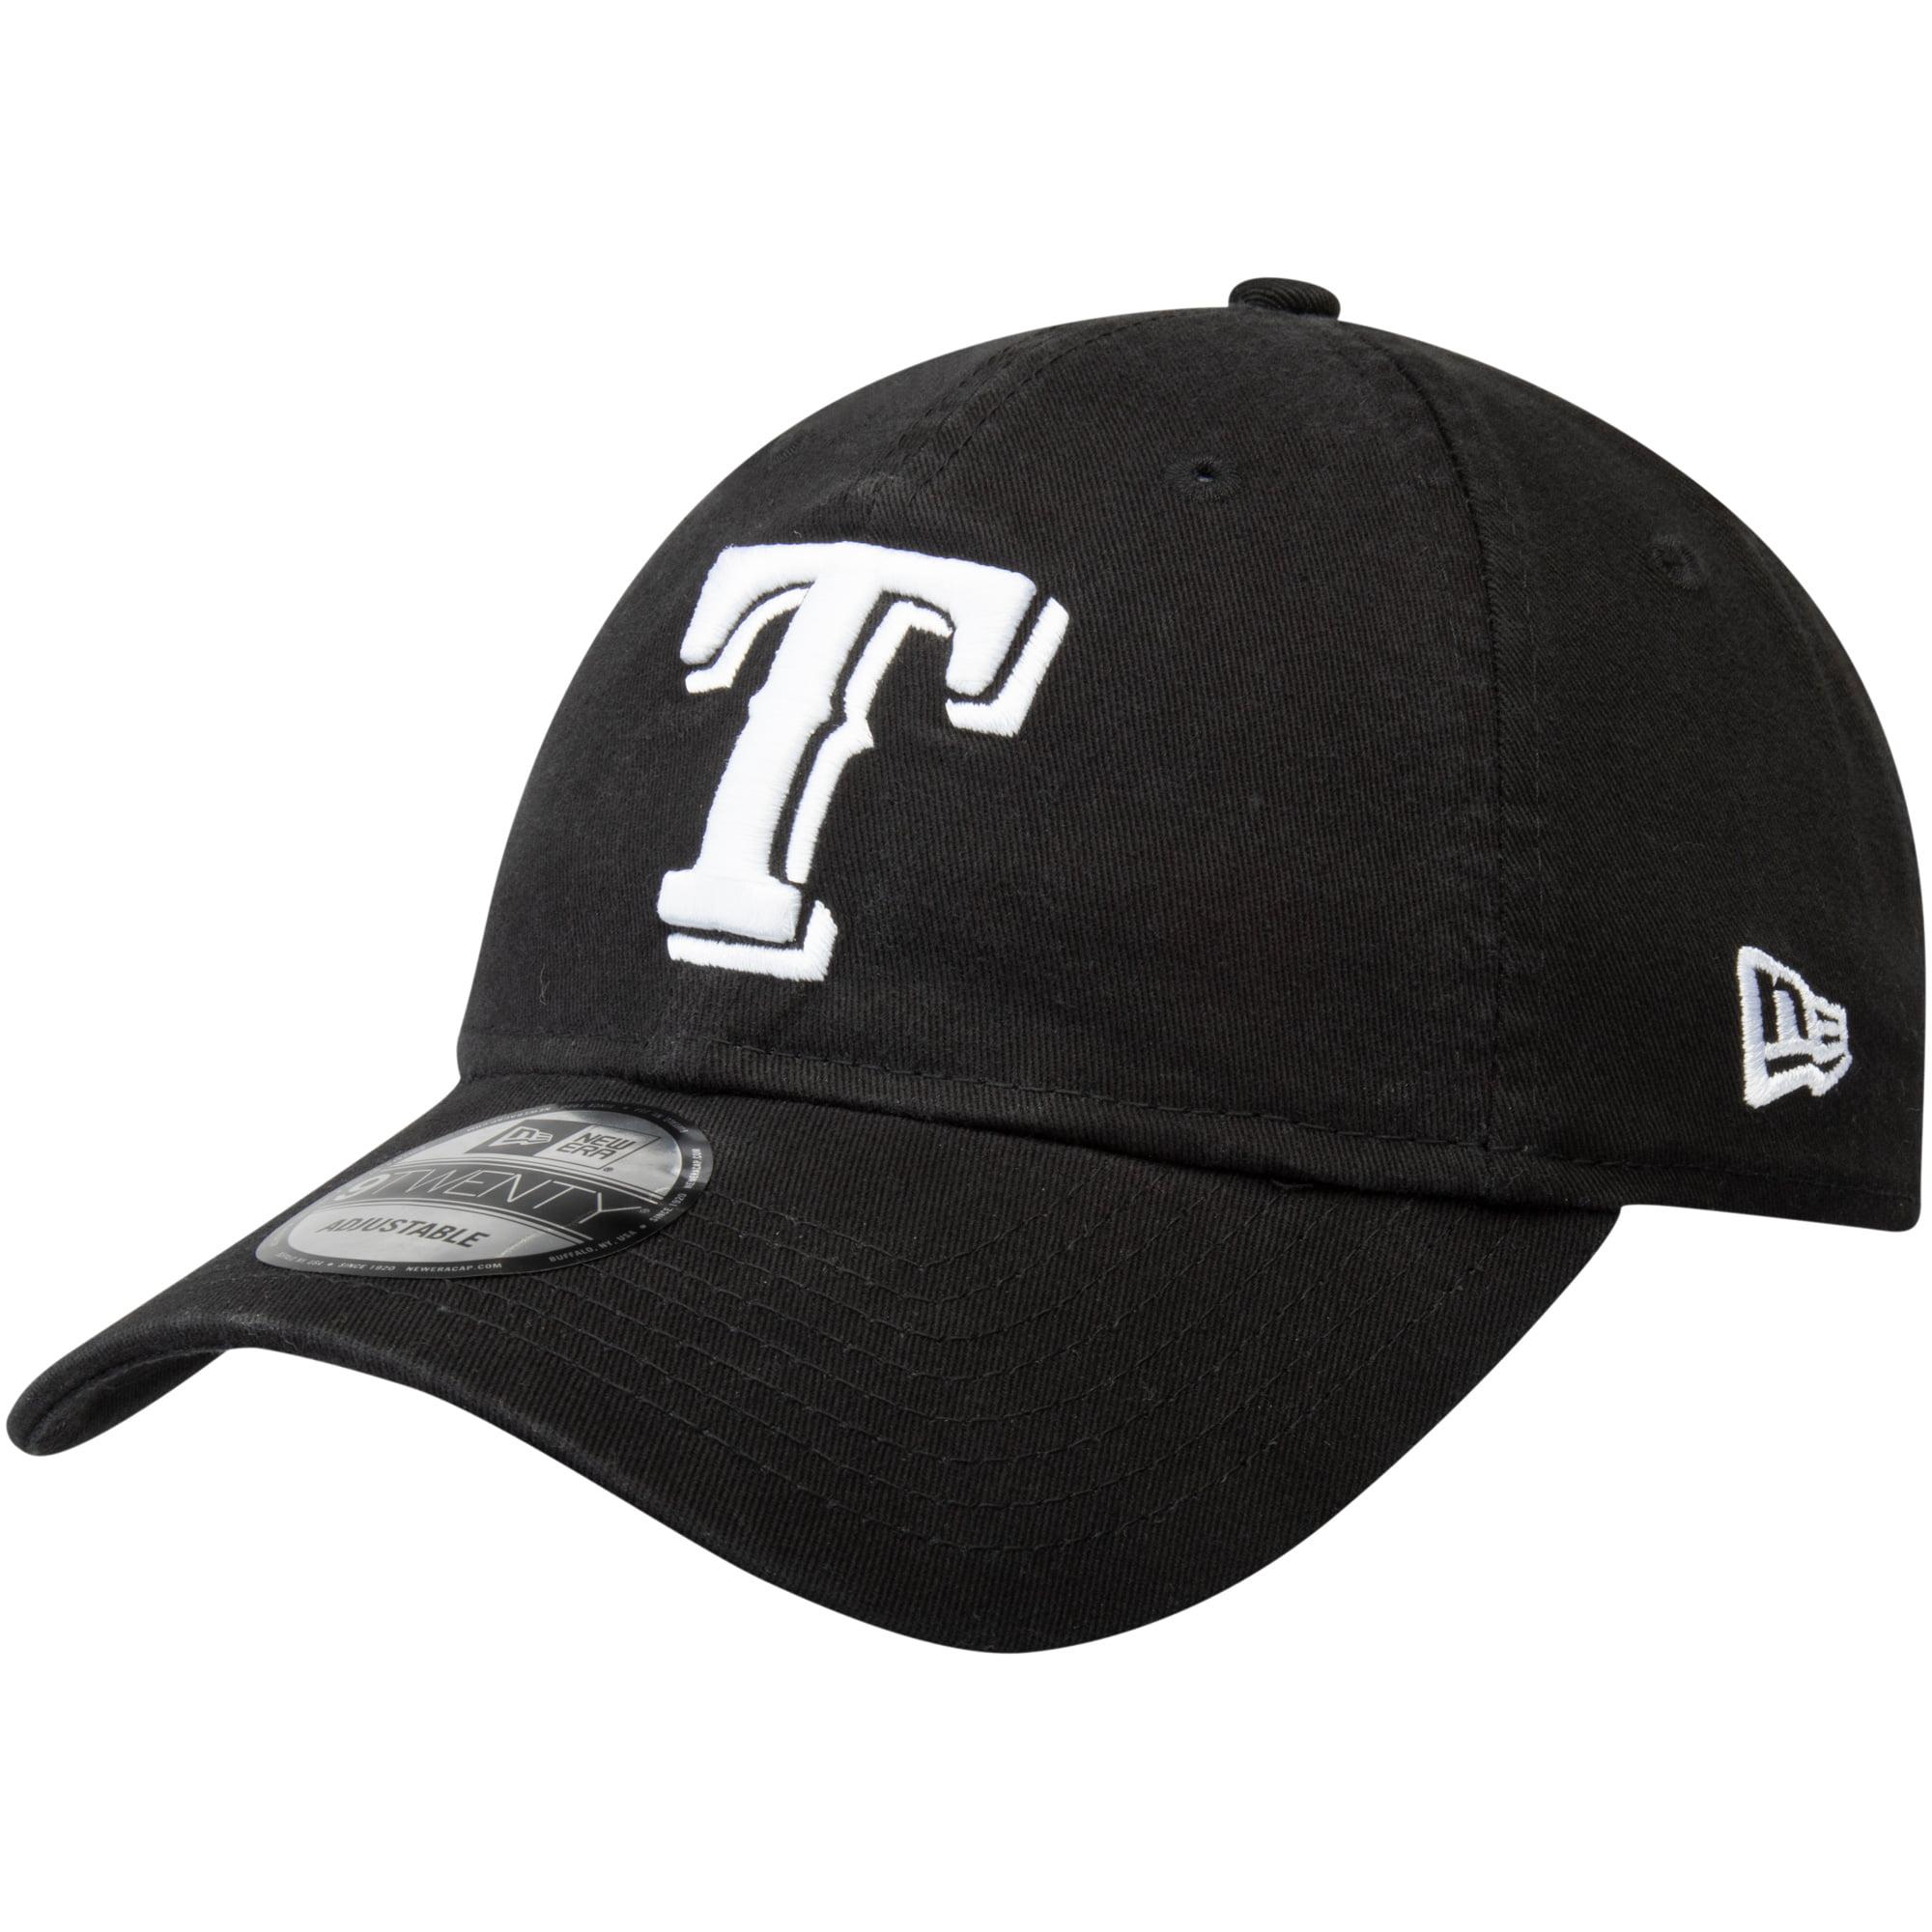 Texas Rangers New Era Core Classic Twill 9TWENTY Adjustable Hat - Black - OSFA